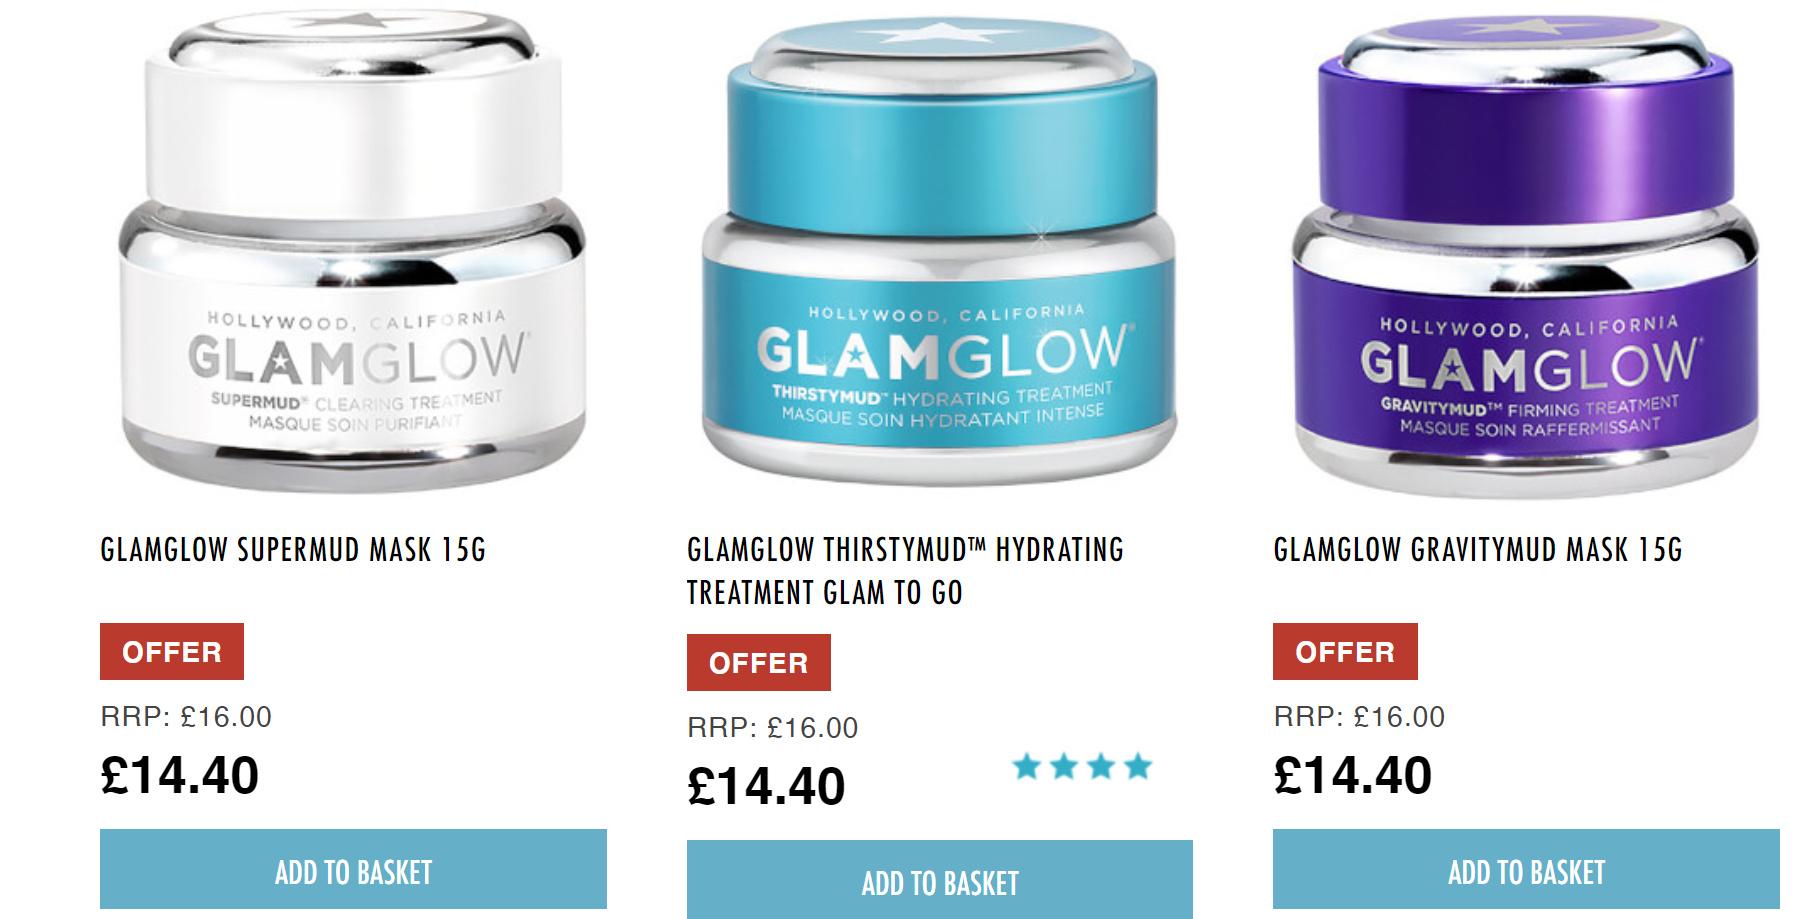 GLAMGLOW Glow Mask 10% OFF